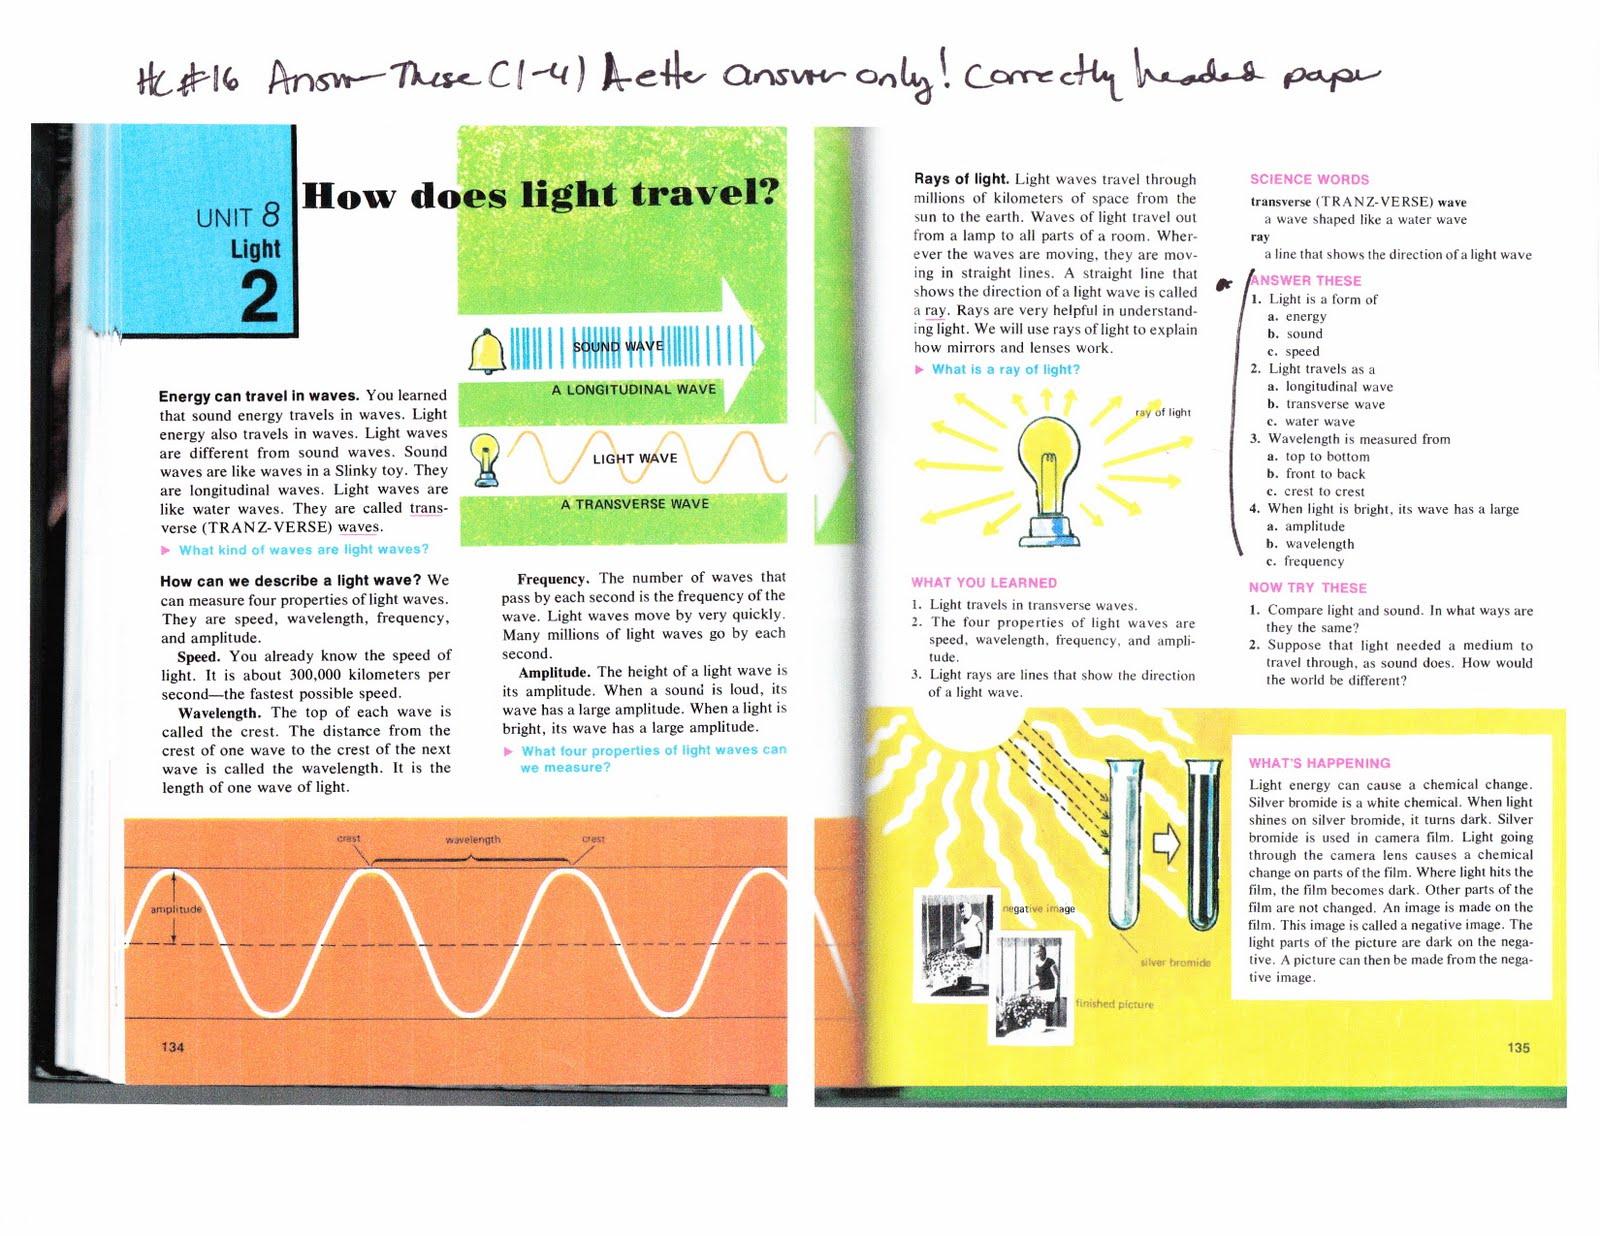 dr gayden 39 s seventh grade science class october 2010. Black Bedroom Furniture Sets. Home Design Ideas